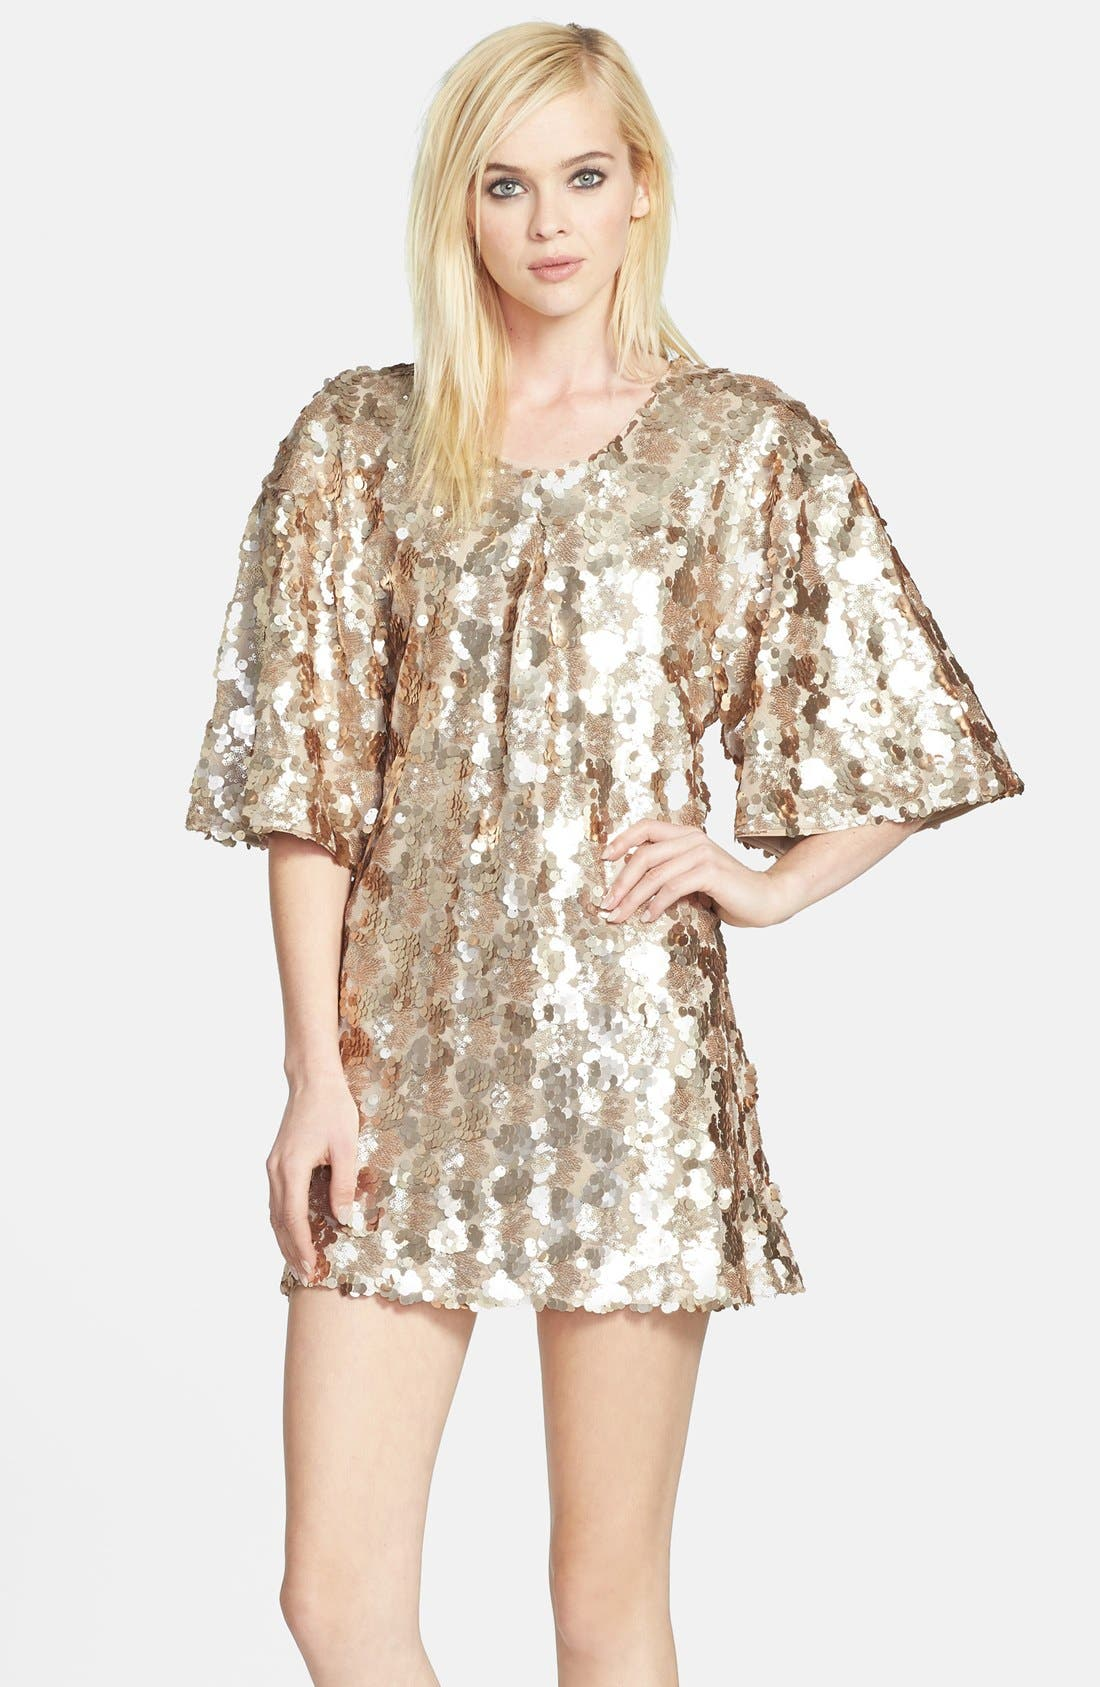 Alternate Image 1 Selected - Dress the Population 'Brooklyn' Embellished Shift Dress